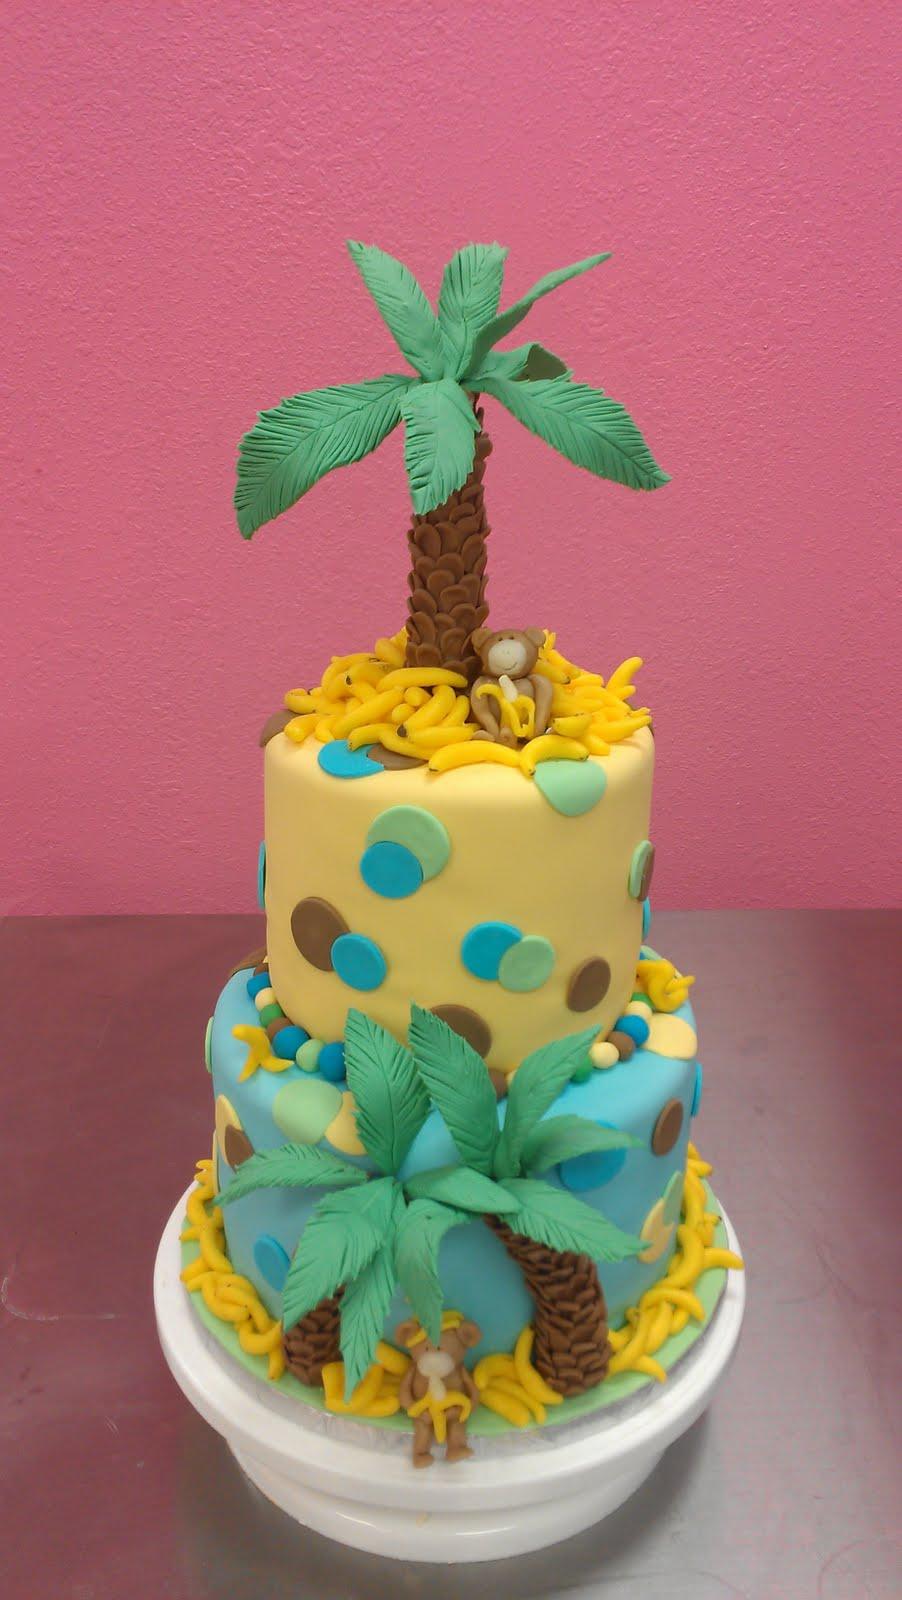 Wendy Woo Cakes: Monkey Cake Tutorial